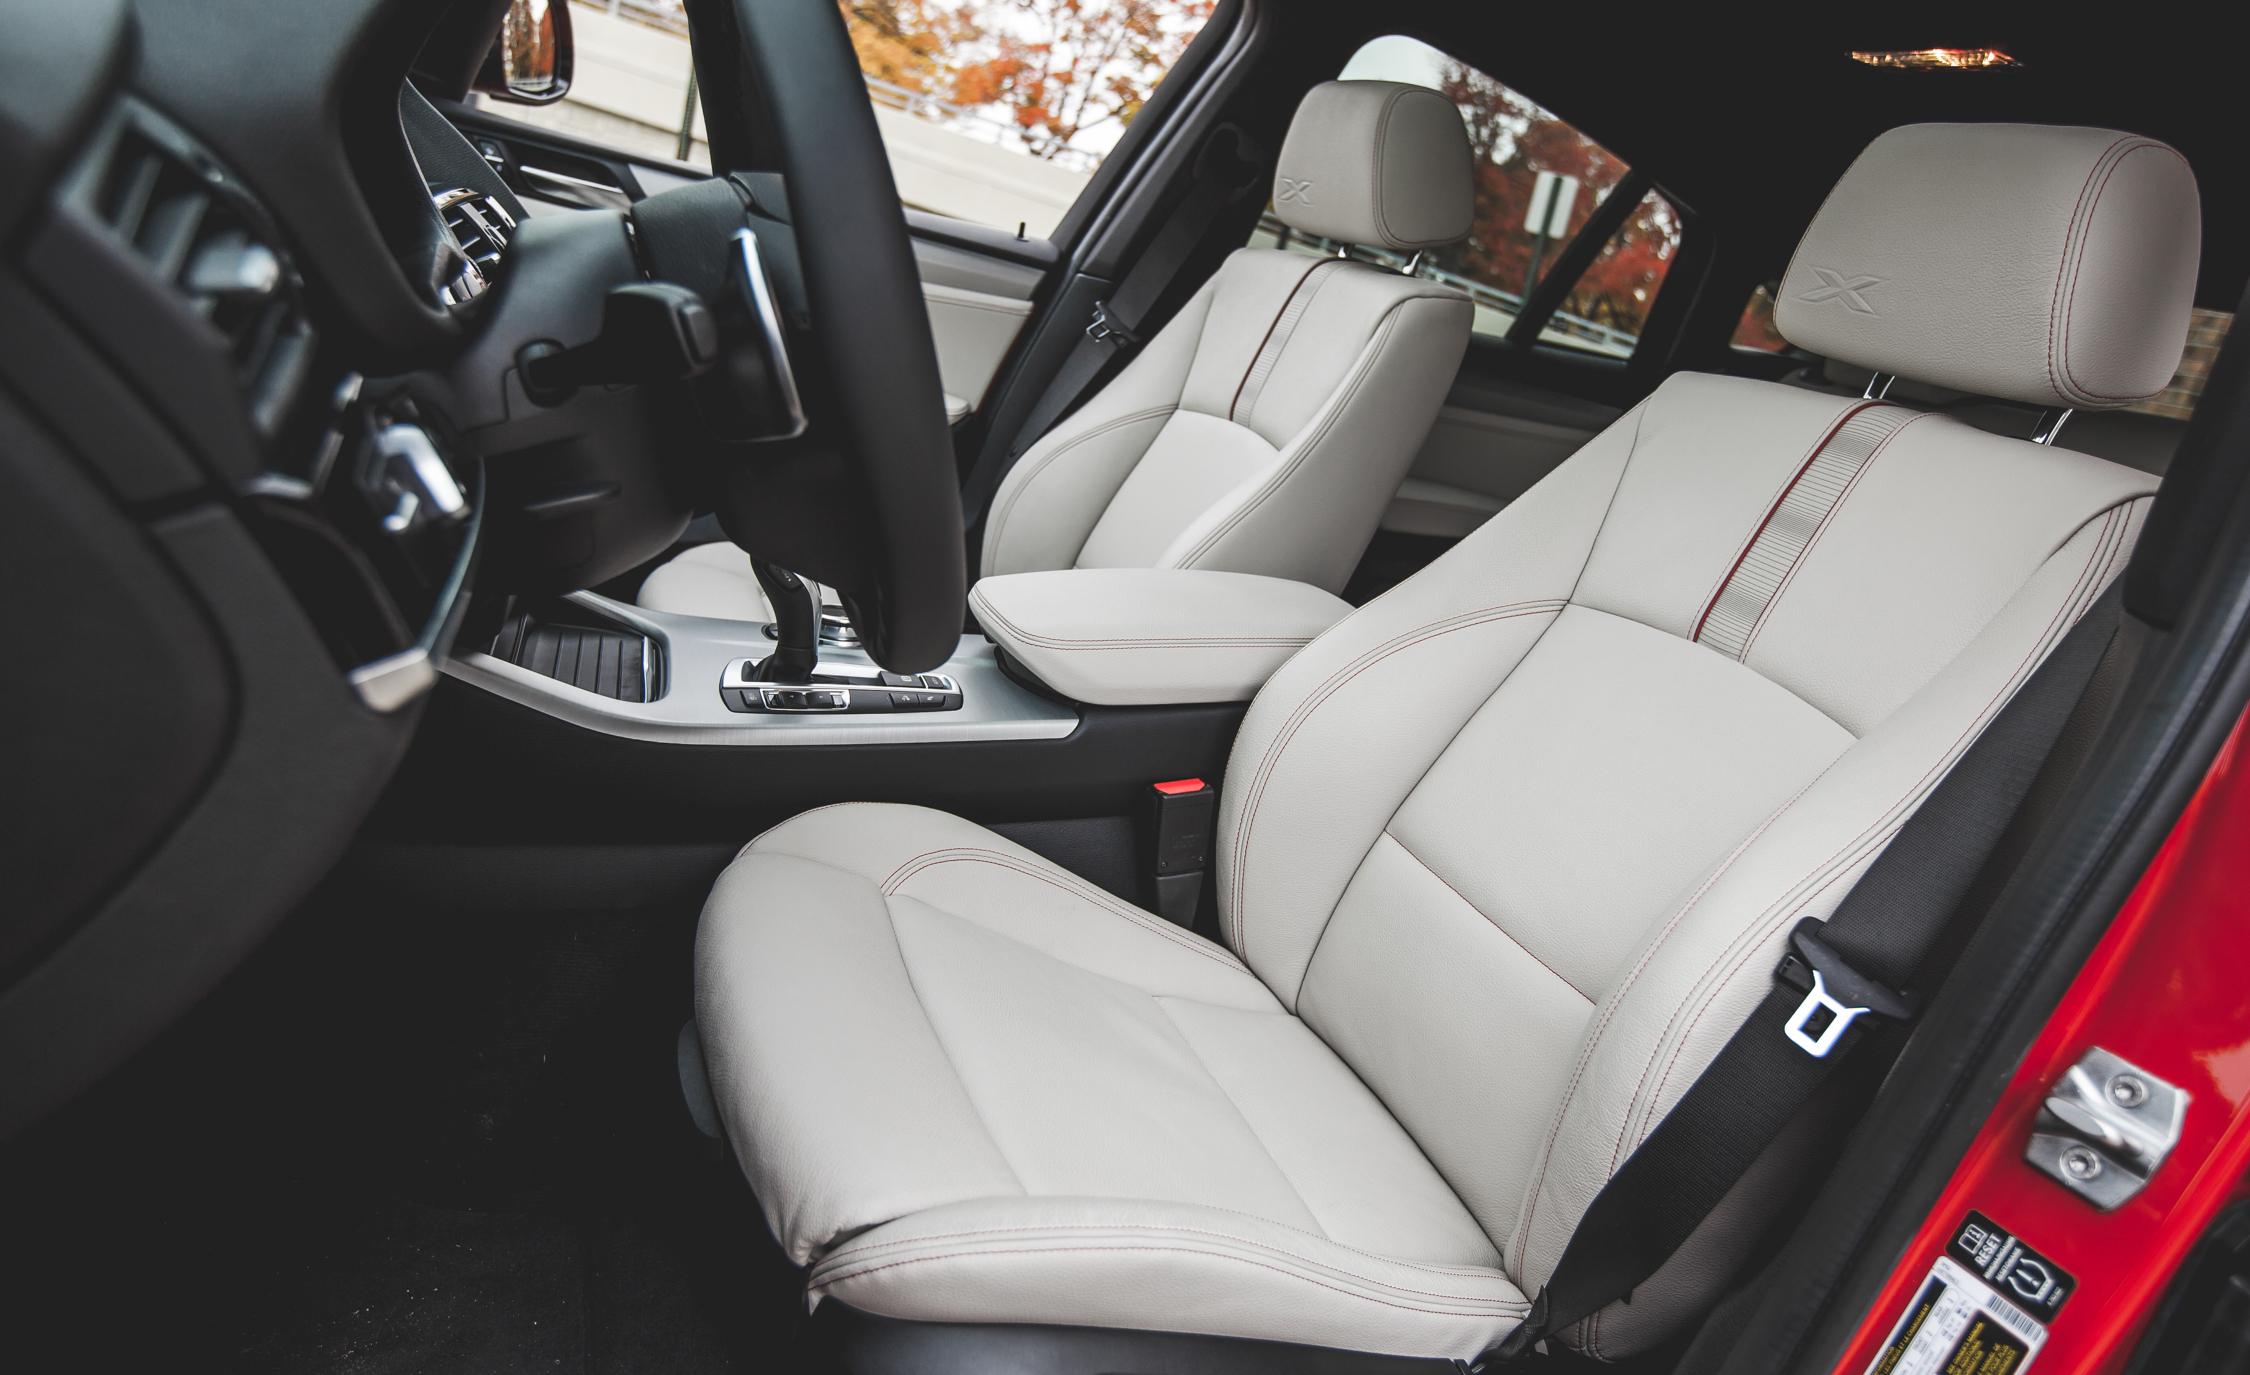 2015 BMW X4 XDrive28i Interior (Photo 16 of 29)